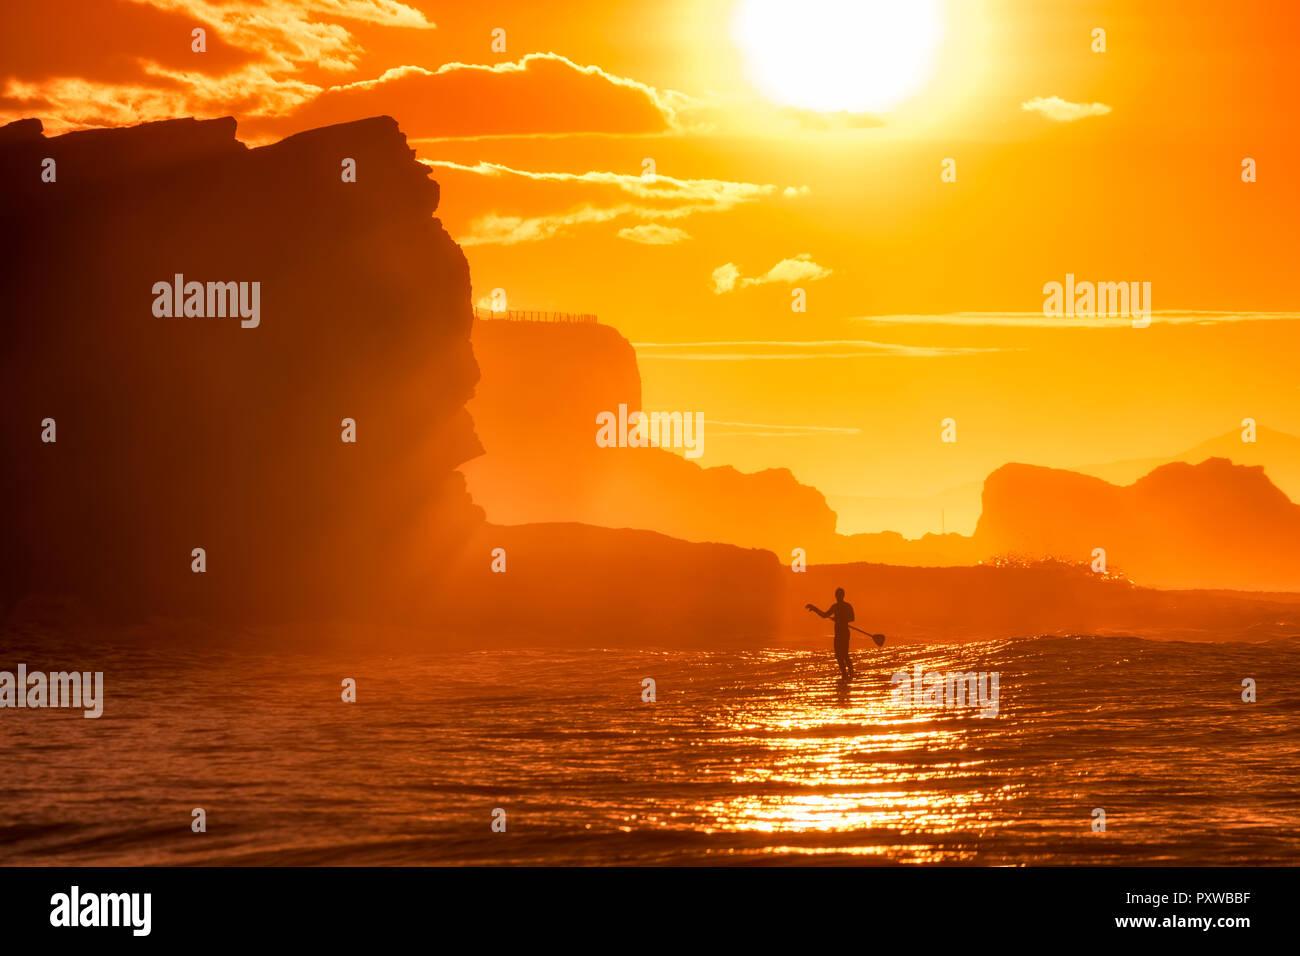 UK, Scotland, East Lothian, Water Sport, Paddle Board Surfing, sunset - Stock Image